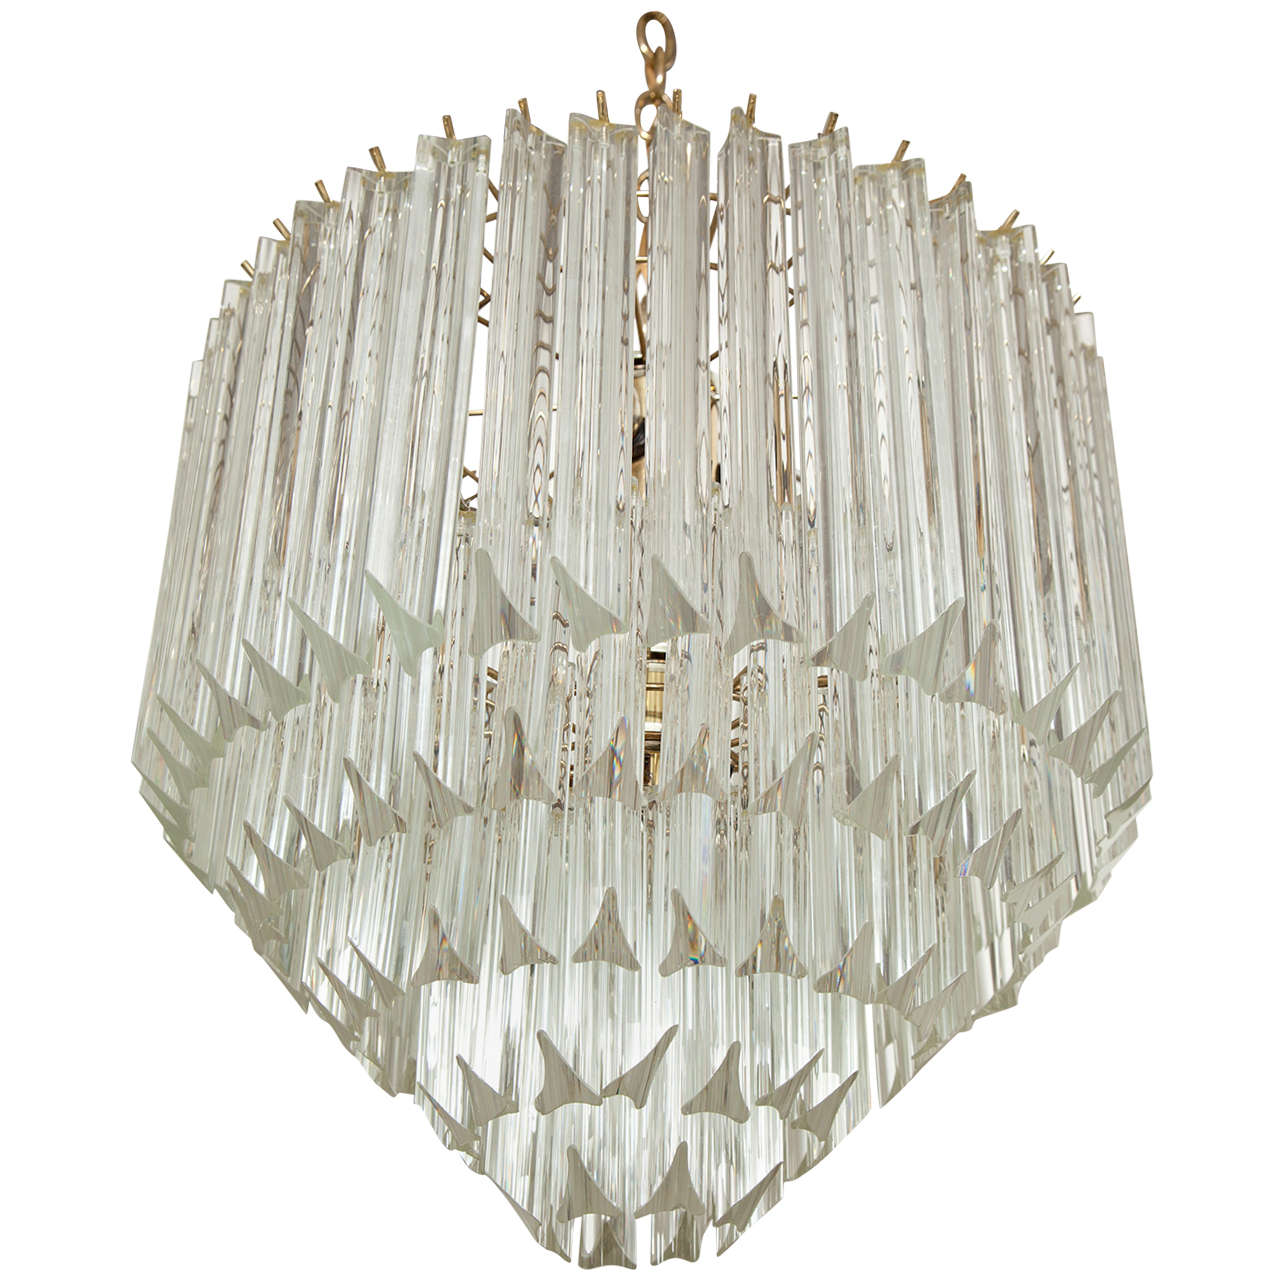 Five tier crystal prism chandelierflush mount by camer for sale five tier crystal prism chandelierflush mount by camer 1 arubaitofo Choice Image